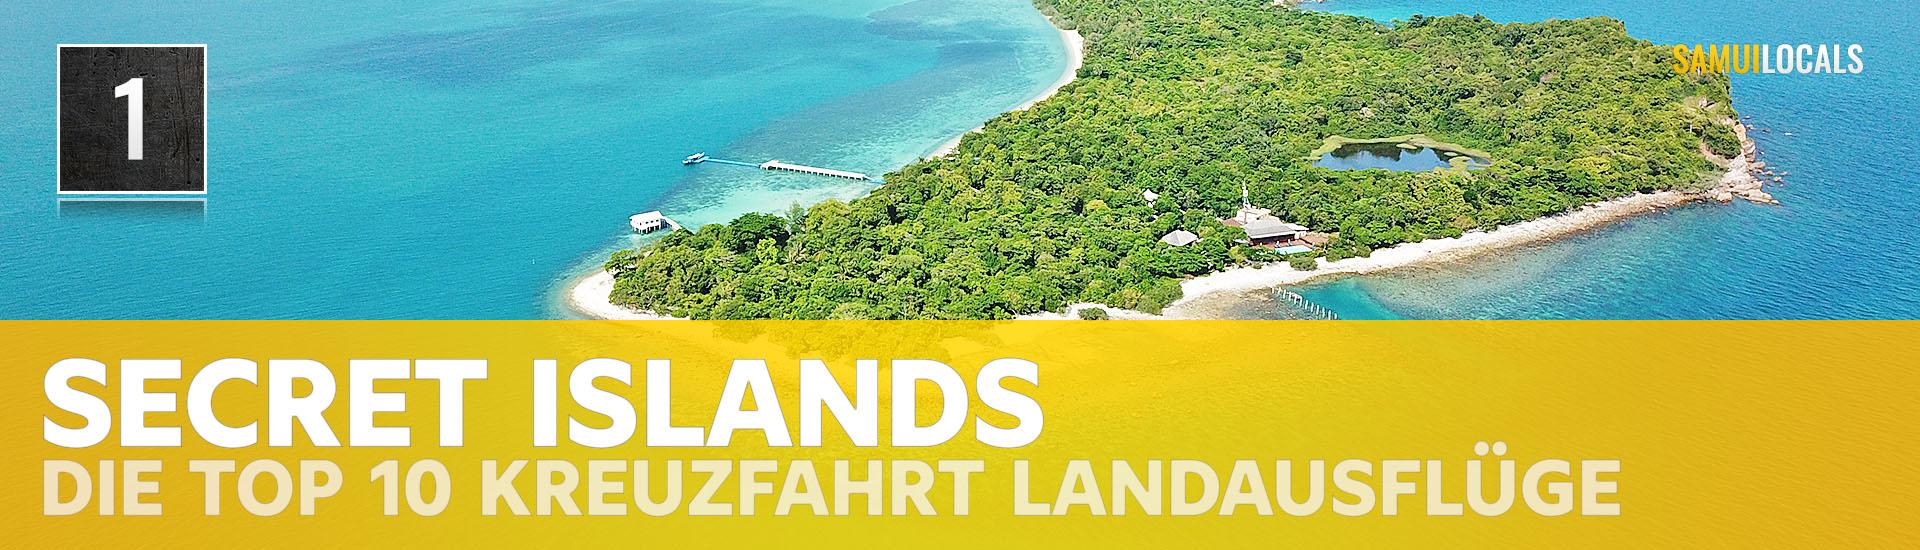 top_10_kreuzfahrt_landausfluege_secret_islands